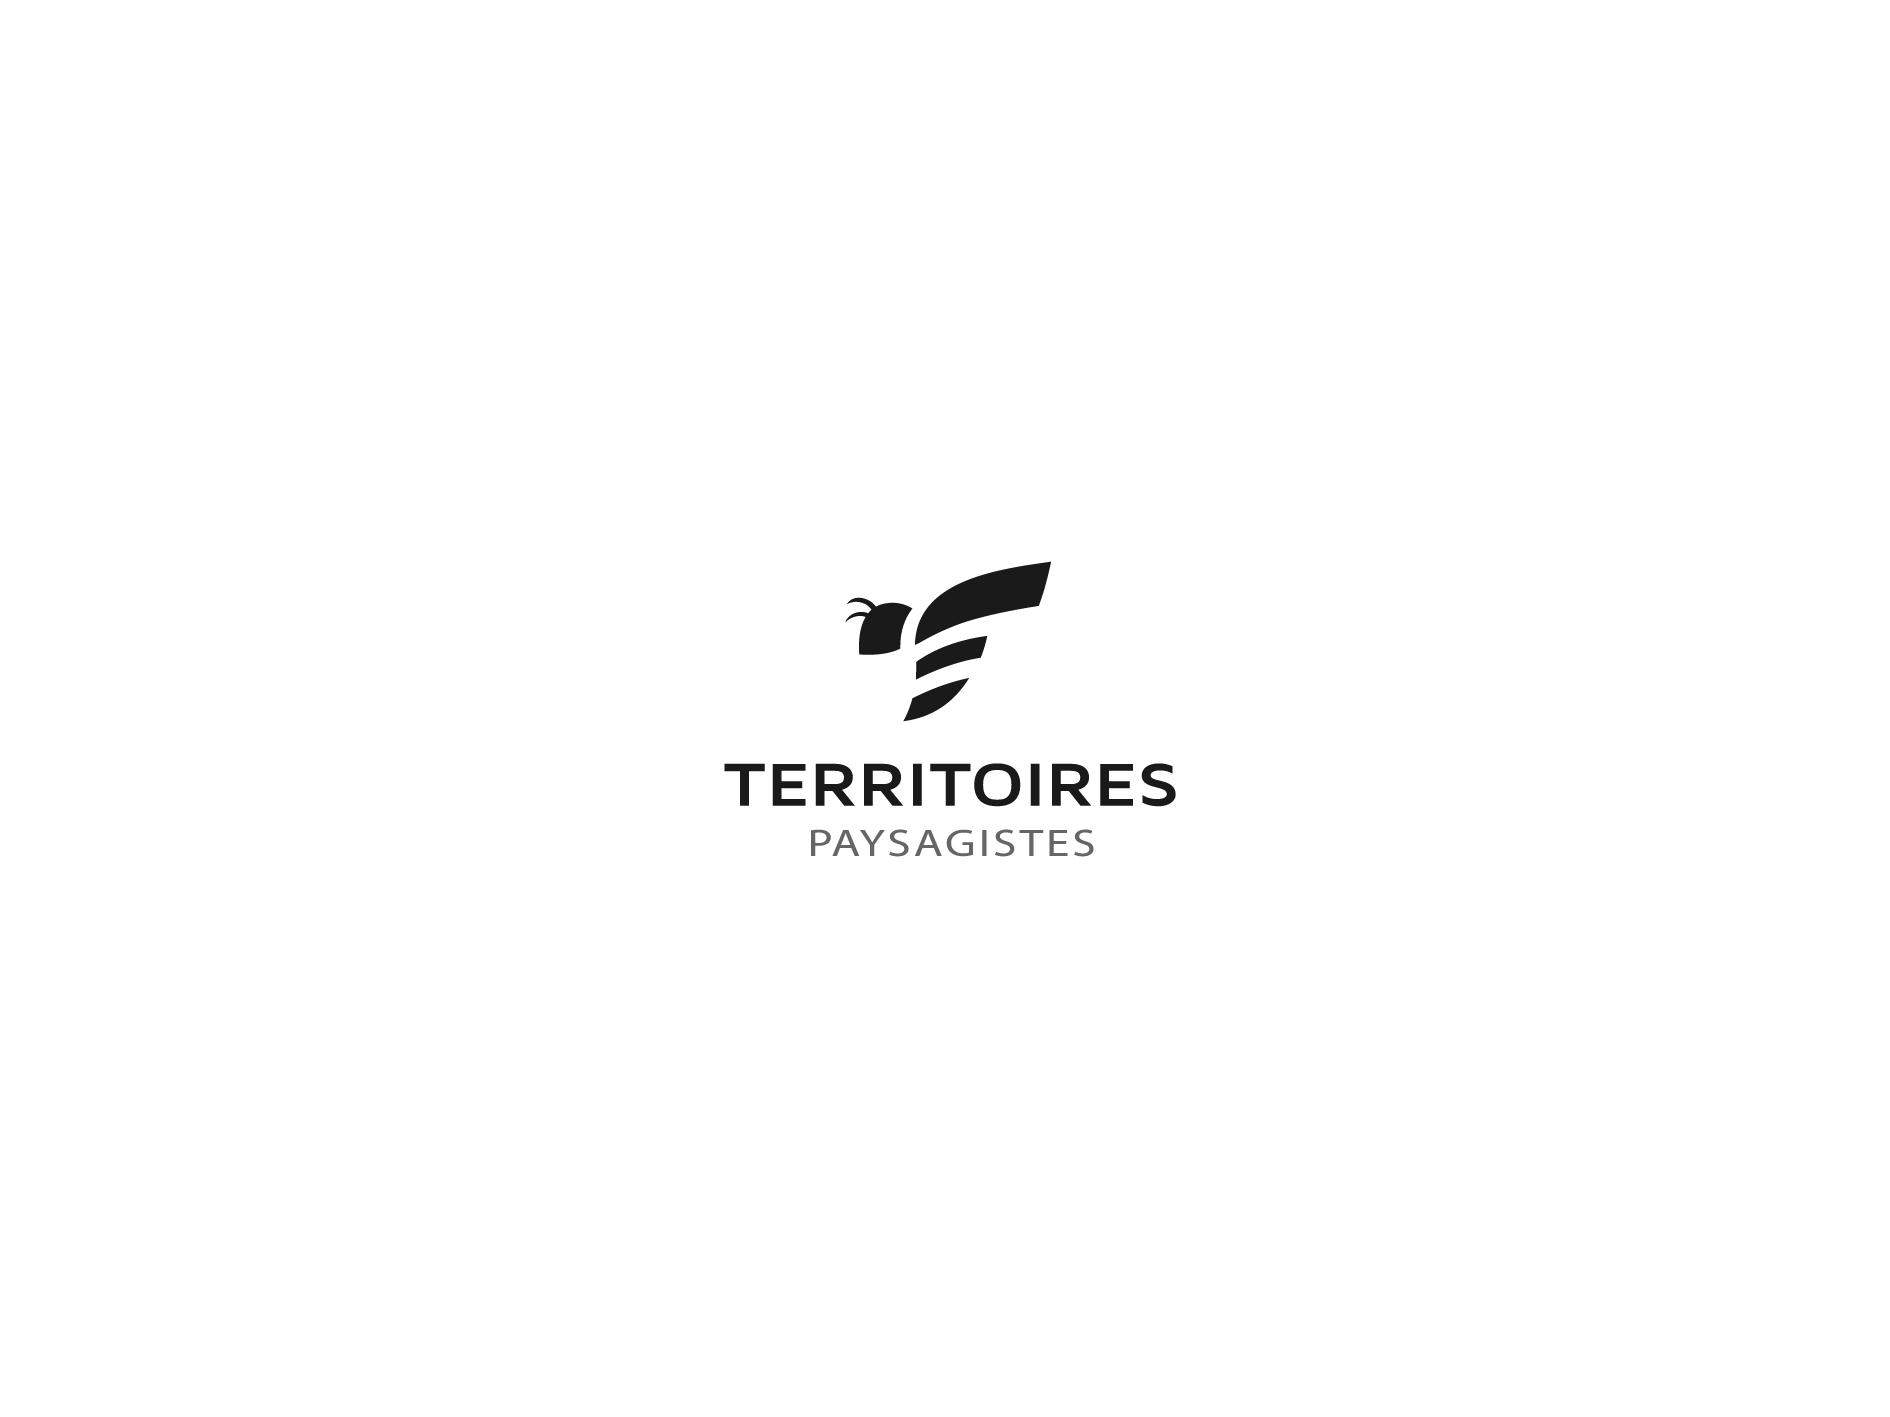 Create a designy and conceptual logo for landscape architects